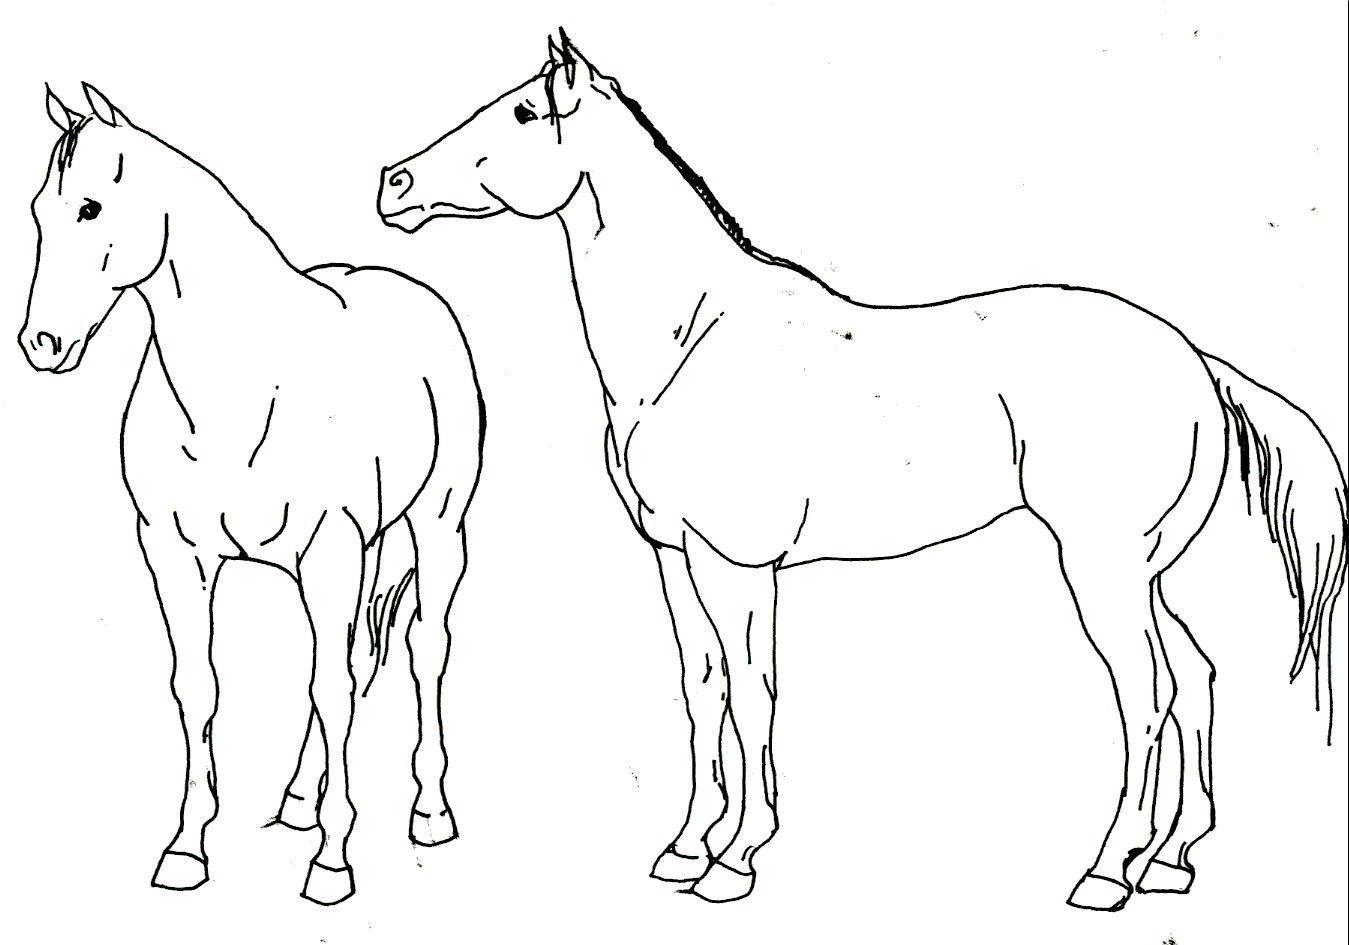 118 with Quarter Horse 28874413 on Bilder Berufe Vorlage also Verliefde Vogels together with Kleeblatt Vorlagen Glucksbringer 481 in addition Quarter Horse 28874413 likewise 40111.